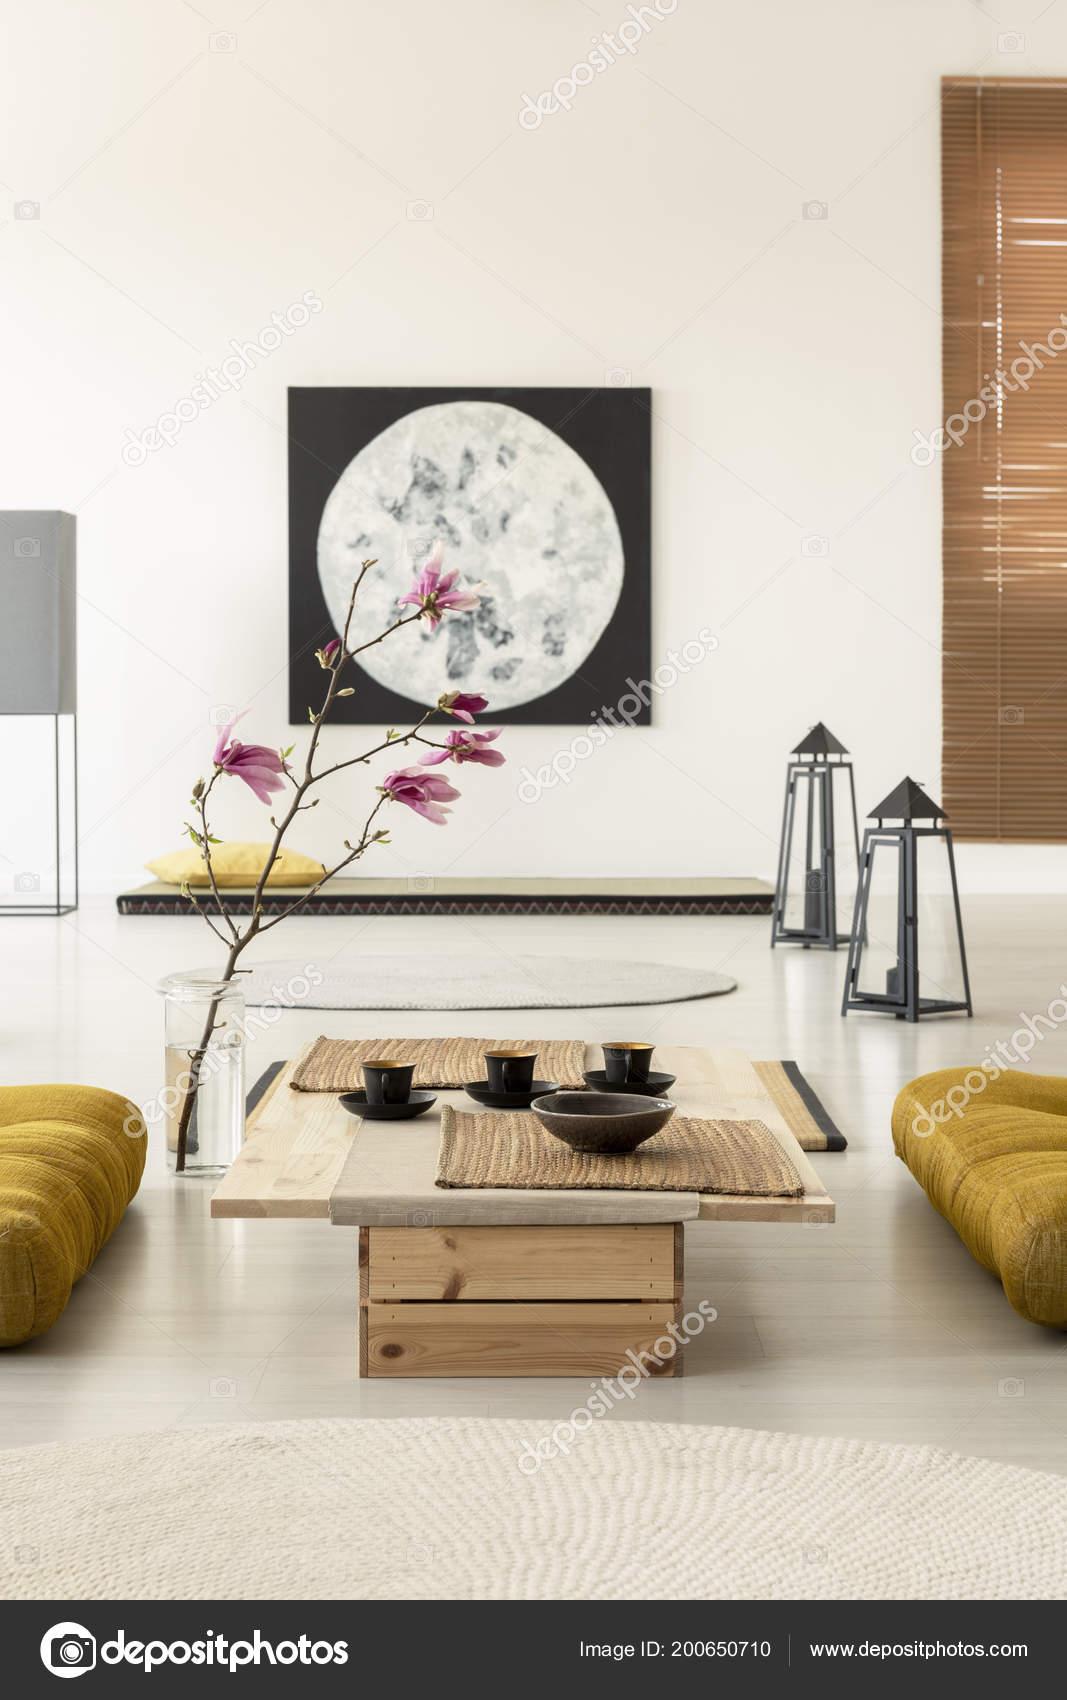 Japanese Style Living Room Set Cherry Blossom Japanese Living Room Interior Painting Coffee Table Cups Stock Photo C Photographee Eu 200650710